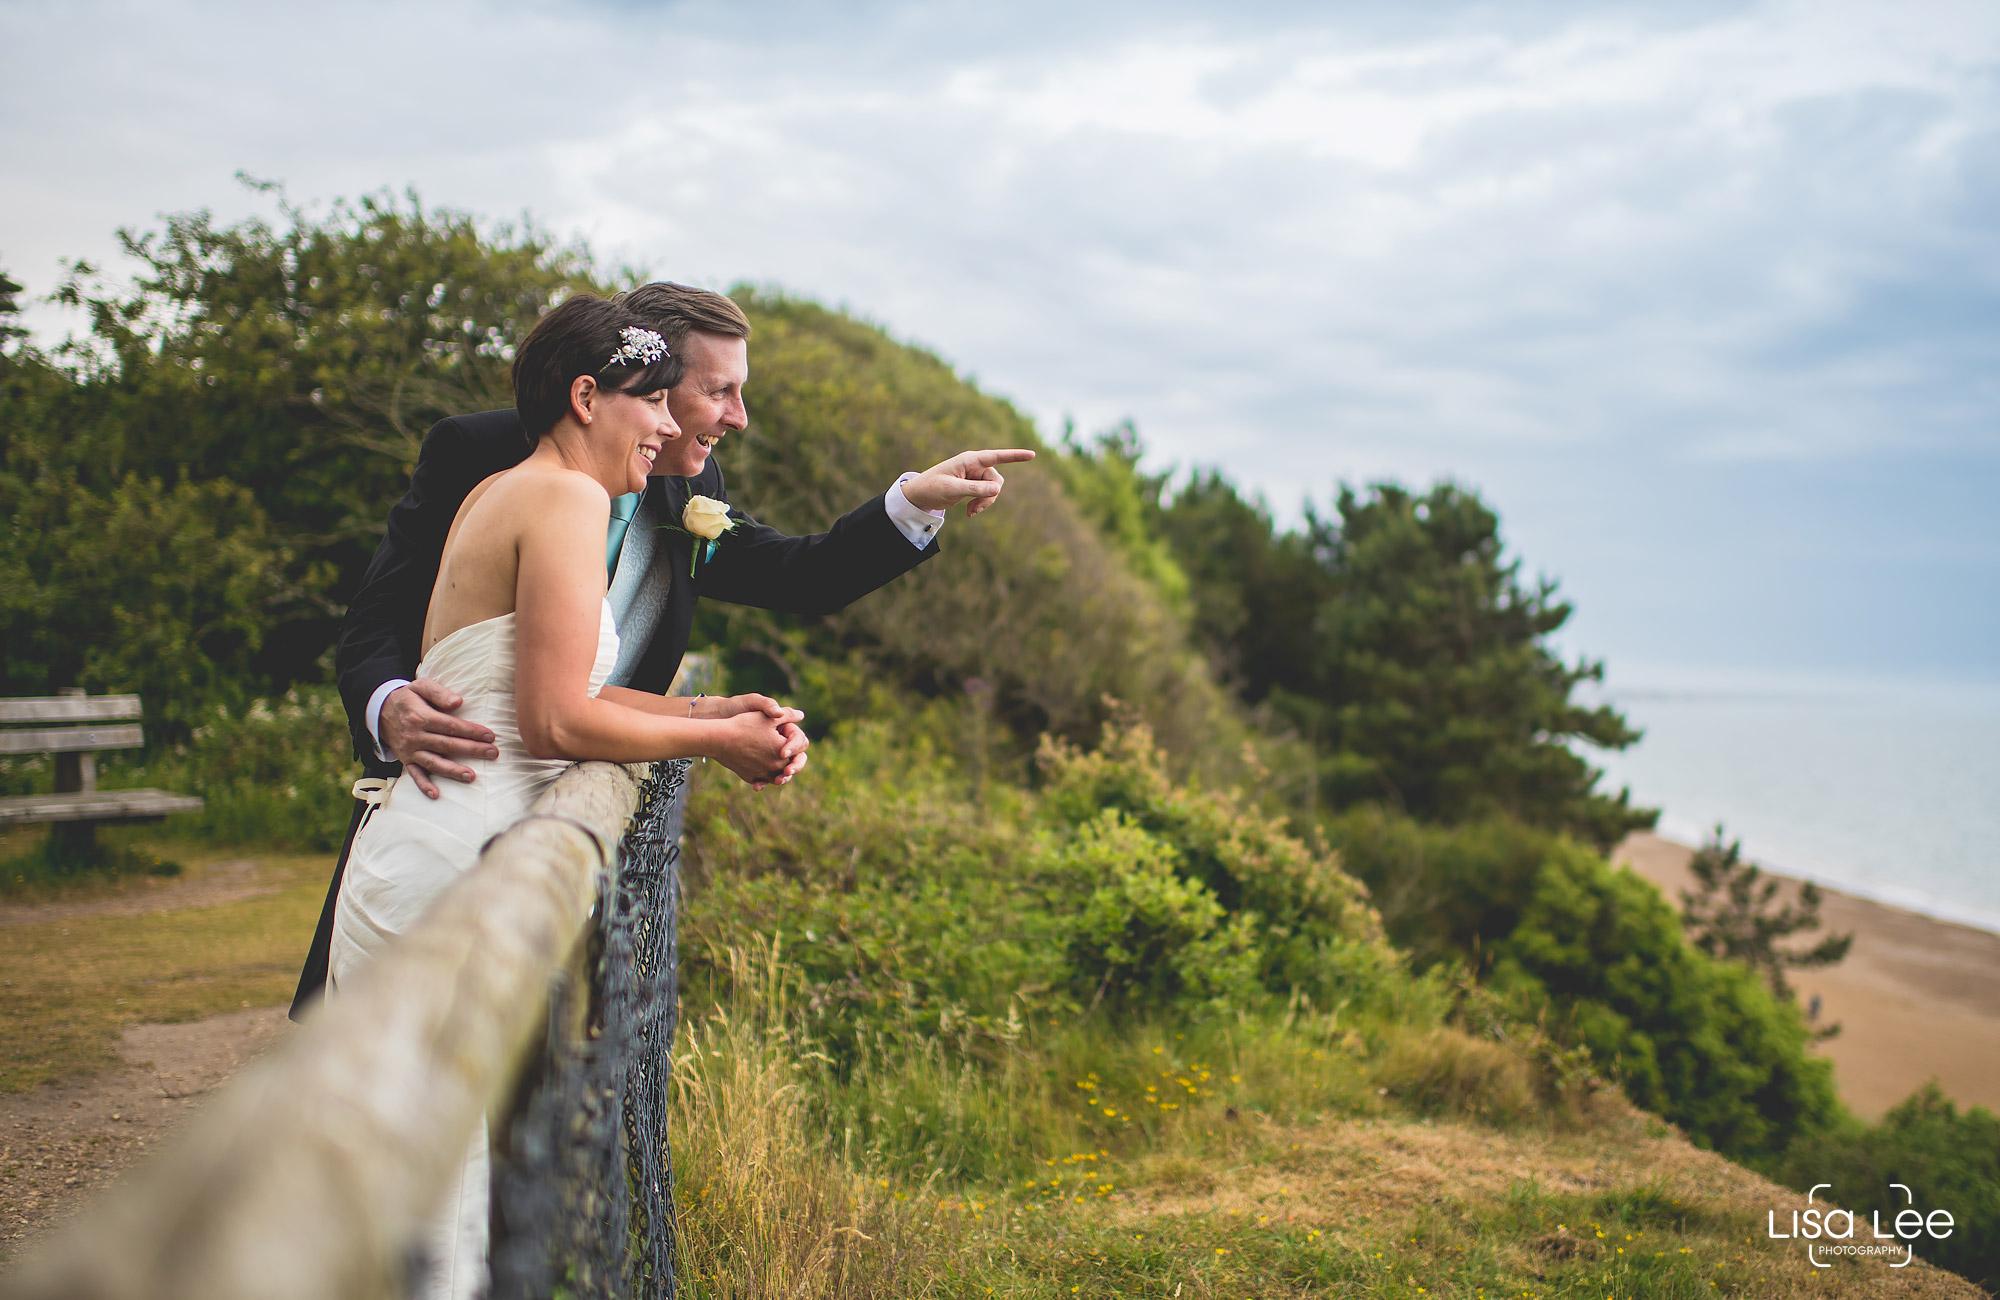 lisa-lee-wedding-photography-burton-steamerpoint2.jpg